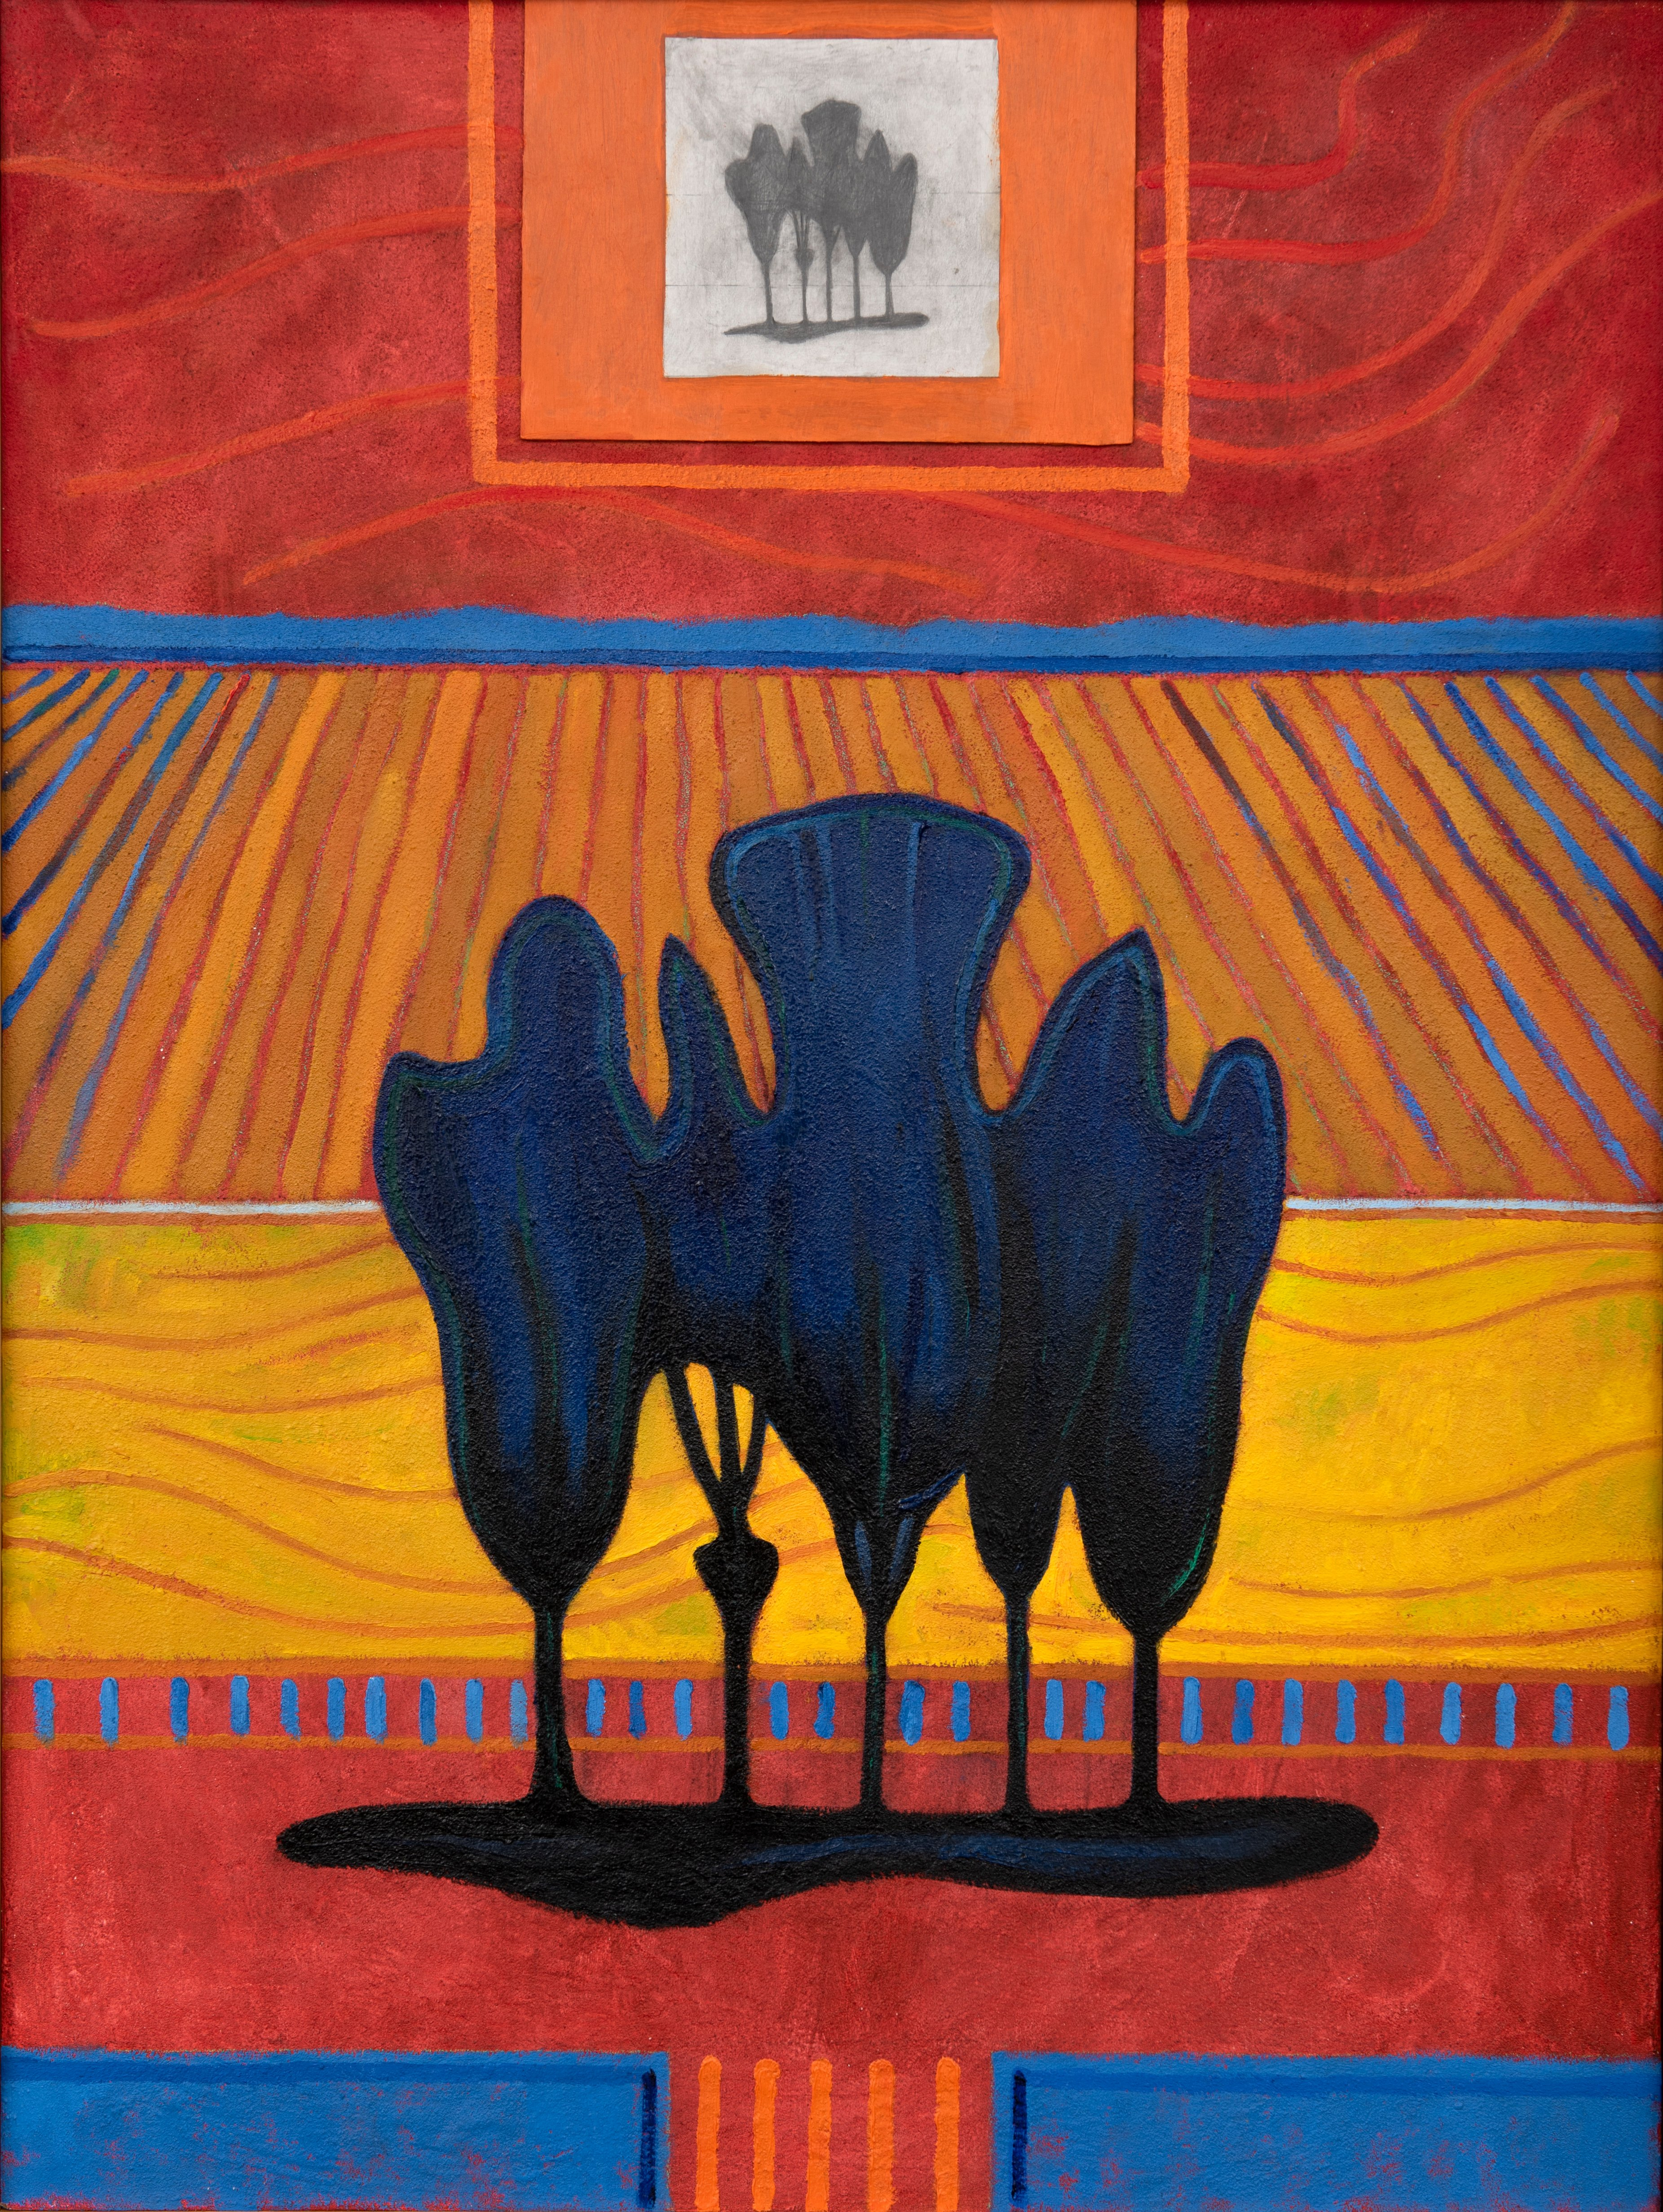 Patrick Landsley, Red Echo, oil/acrylic on board, 1990